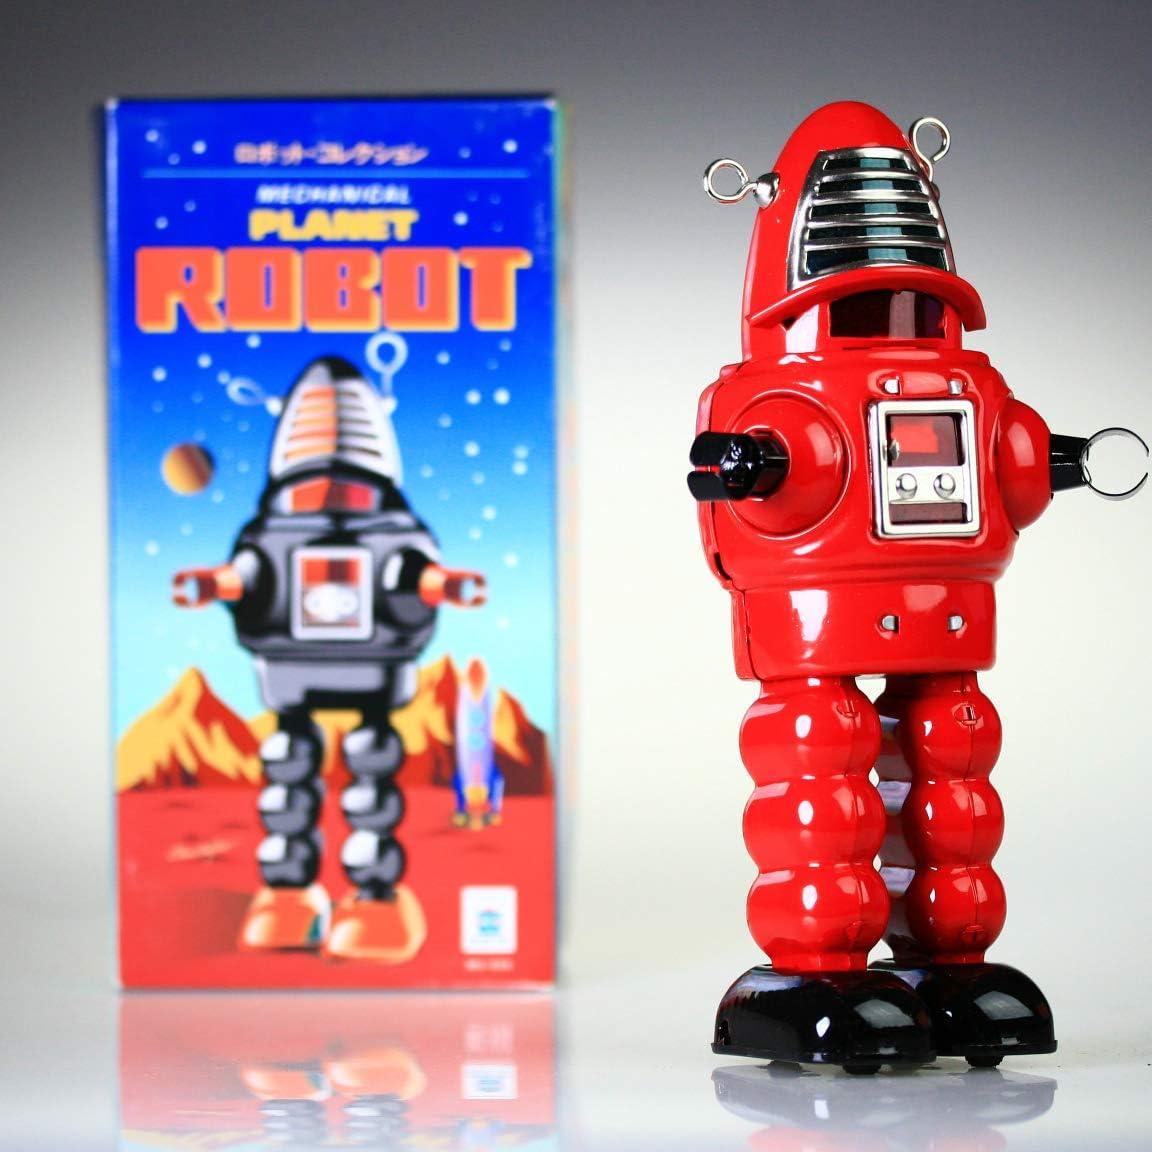 HwaStudio MS430 Estaño Rojo Planeta Robot mecánico, Robby el Robot, Vintage Reproducción acción Integral Juguete Rojo NOSTÁLGICA: Amazon.es: Hogar